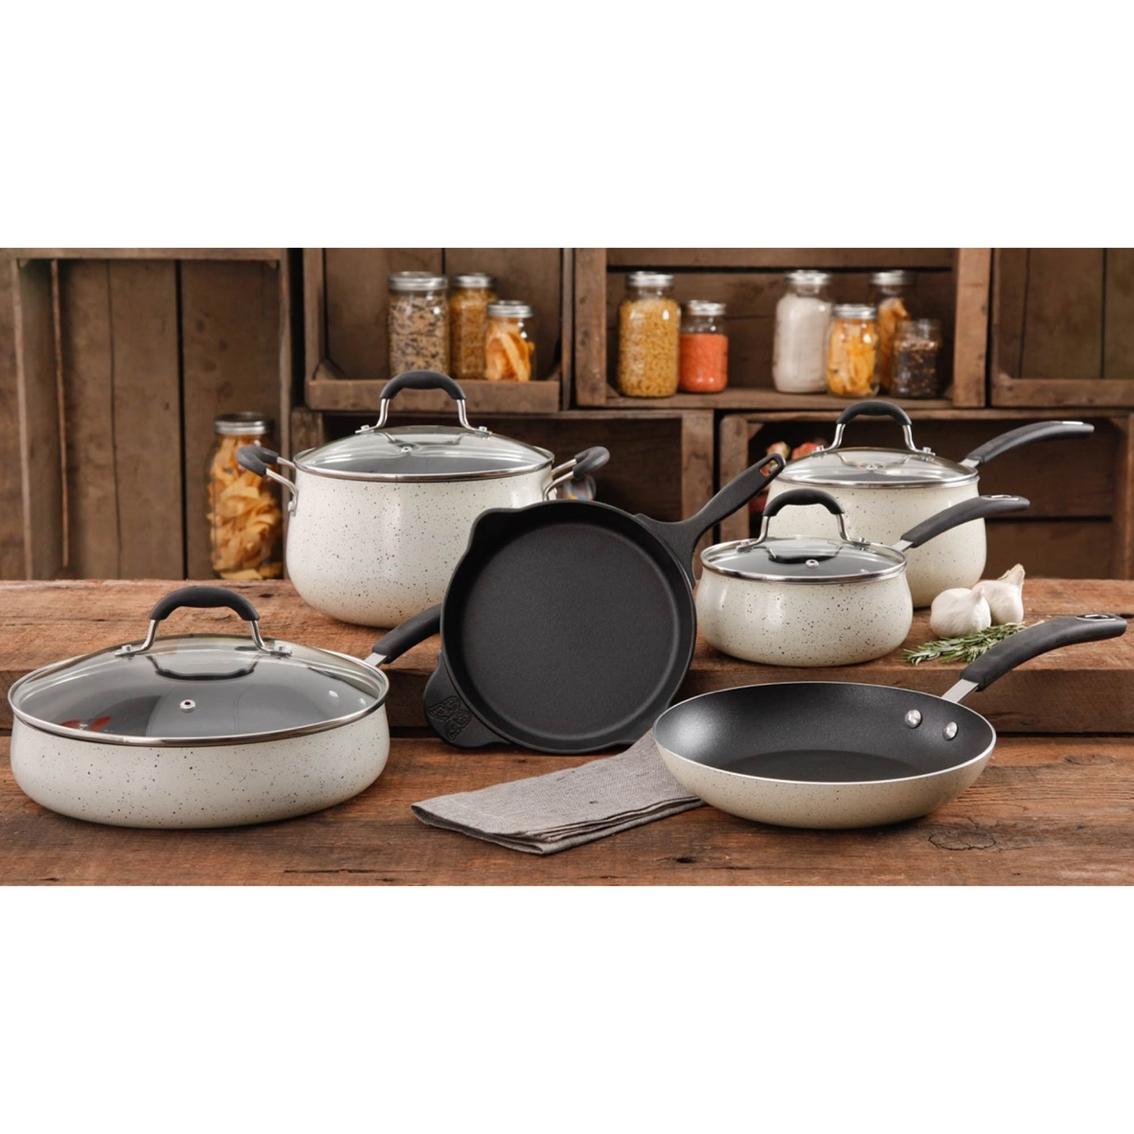 9440f0619ad Pioneer Woman Vintage Enameled Porcelain 10 Pc. Cookware Set ...